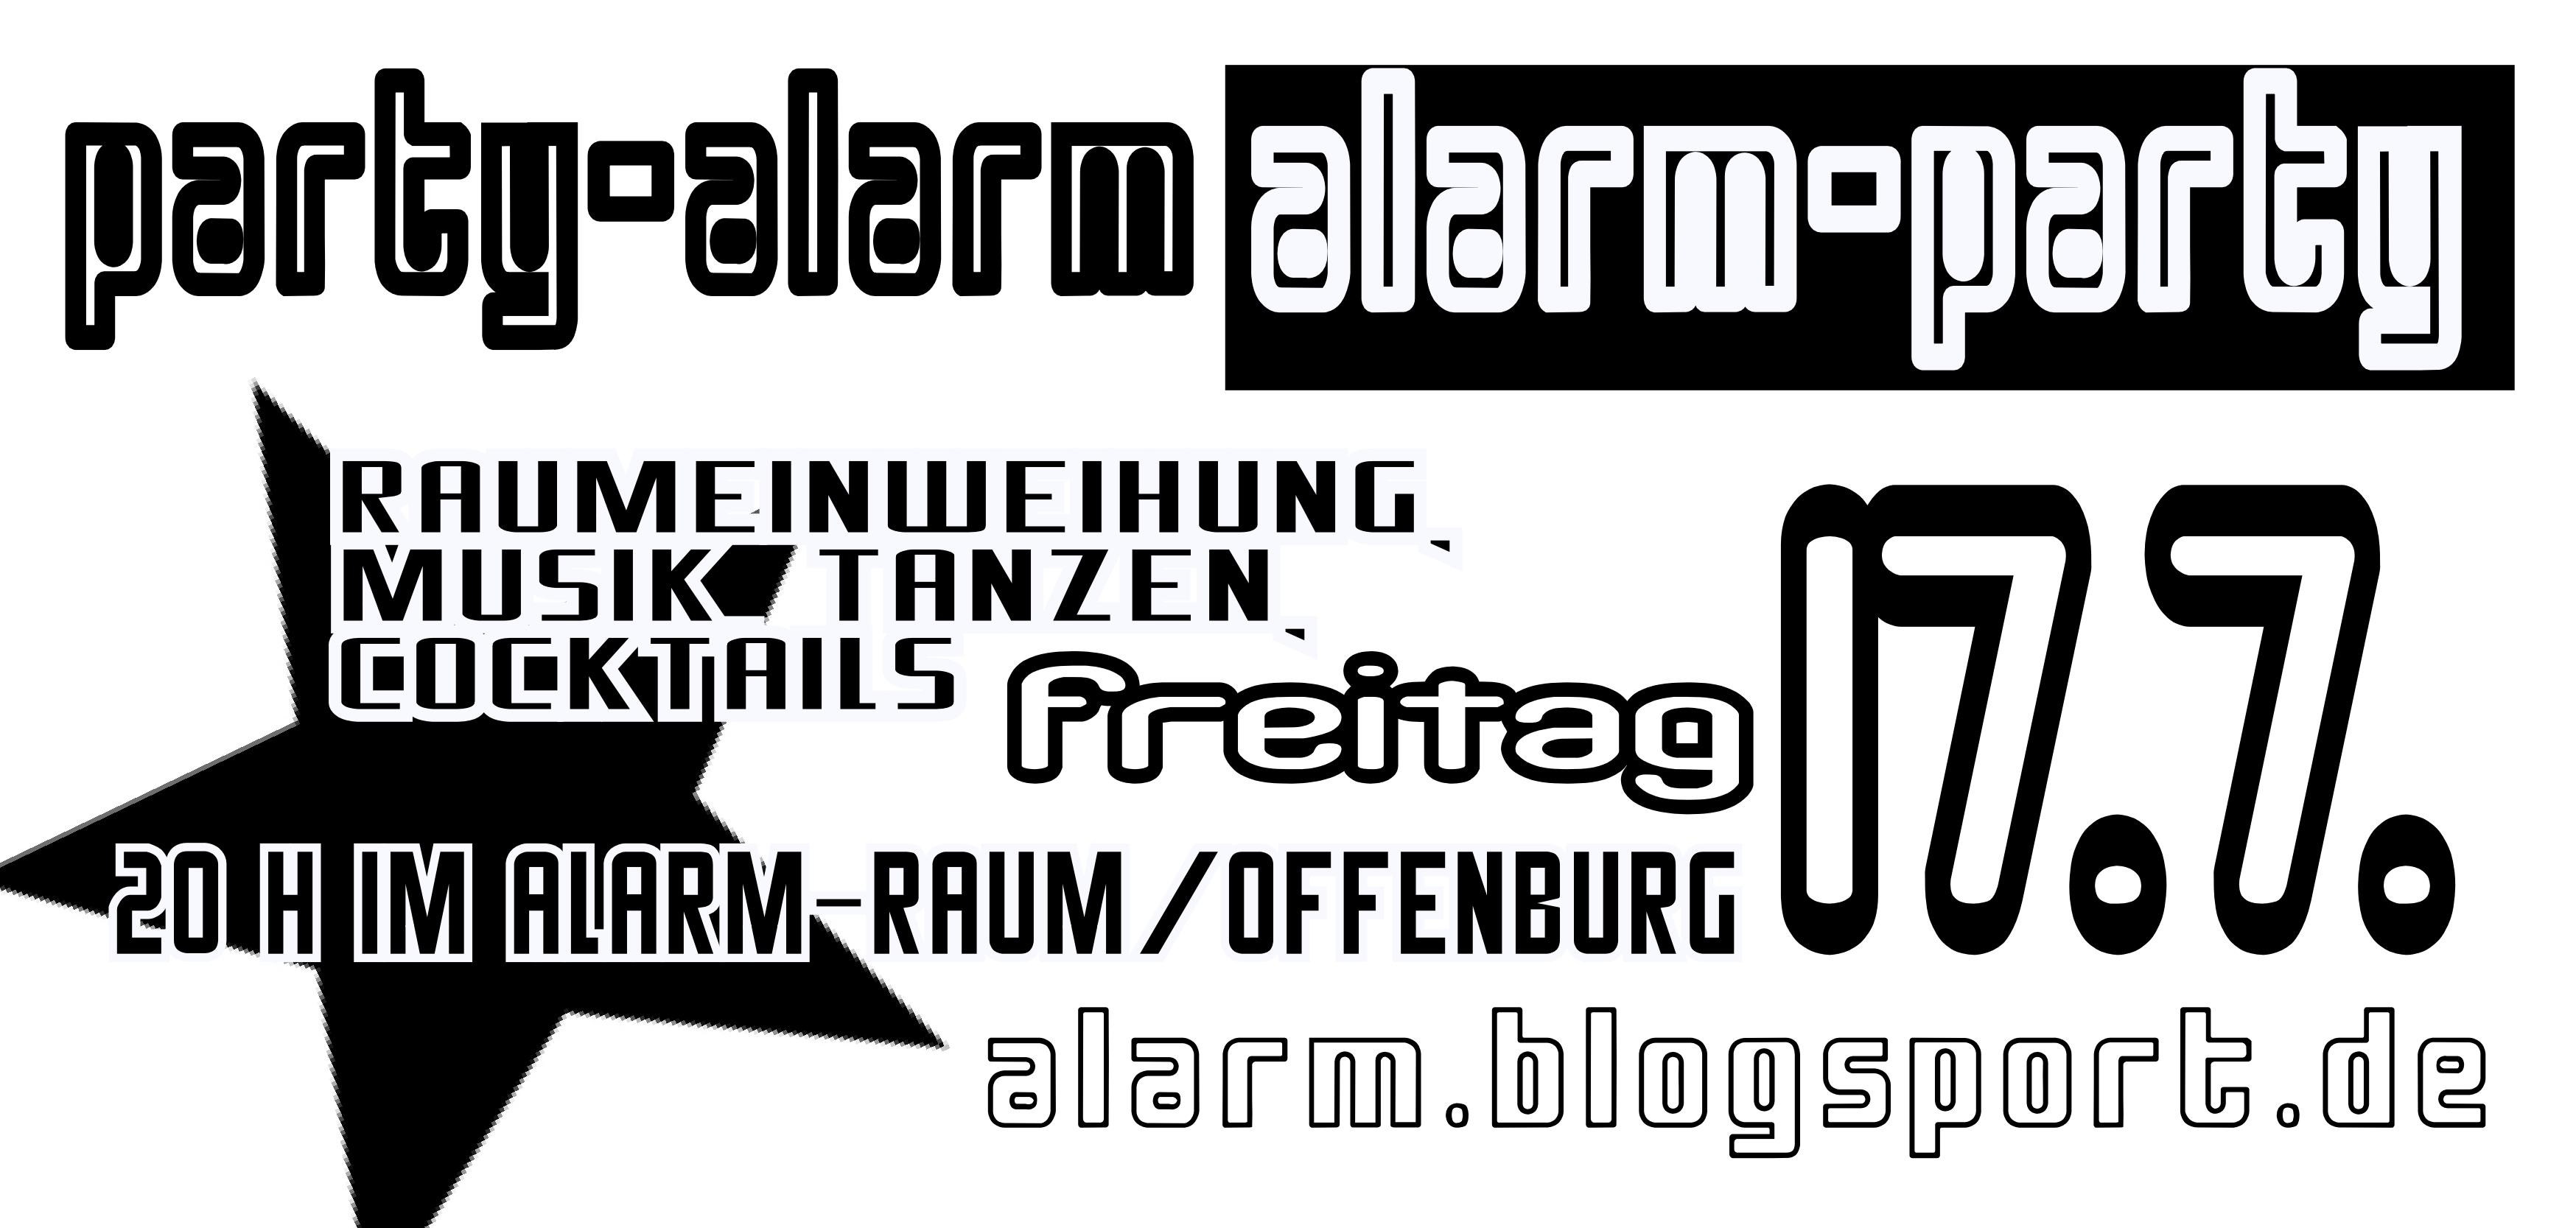 alarm-party 17.7.2009